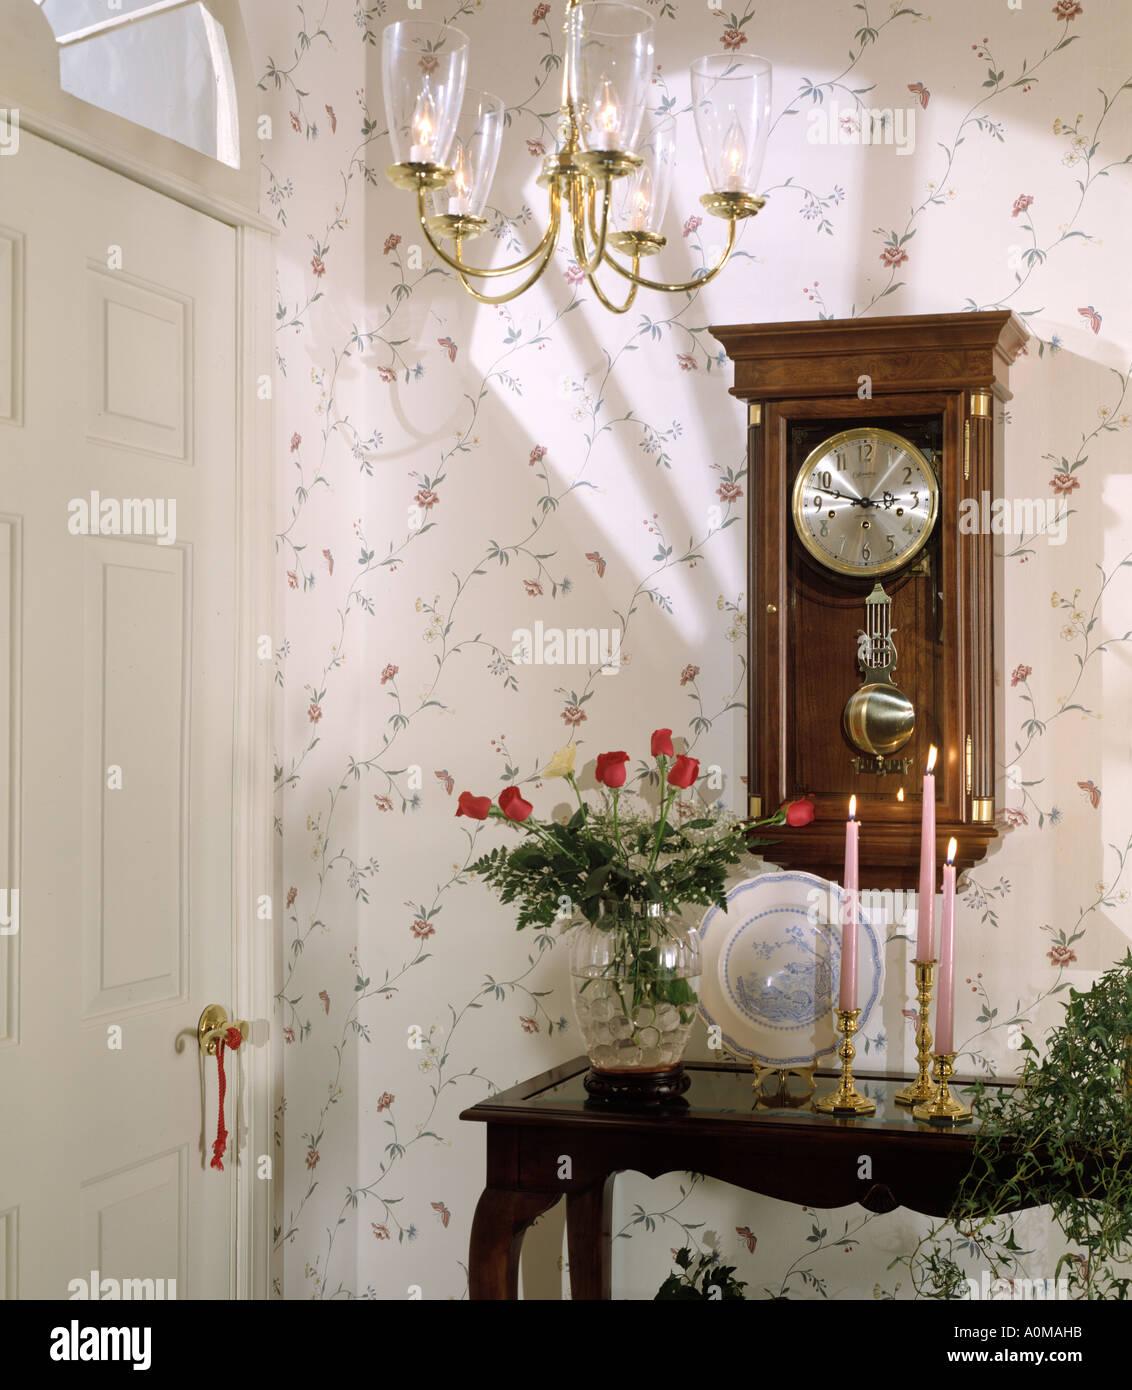 Room Interior Wallpaper Hall Hallway Entrace Hallway Entrance Front Stock Photo Alamy